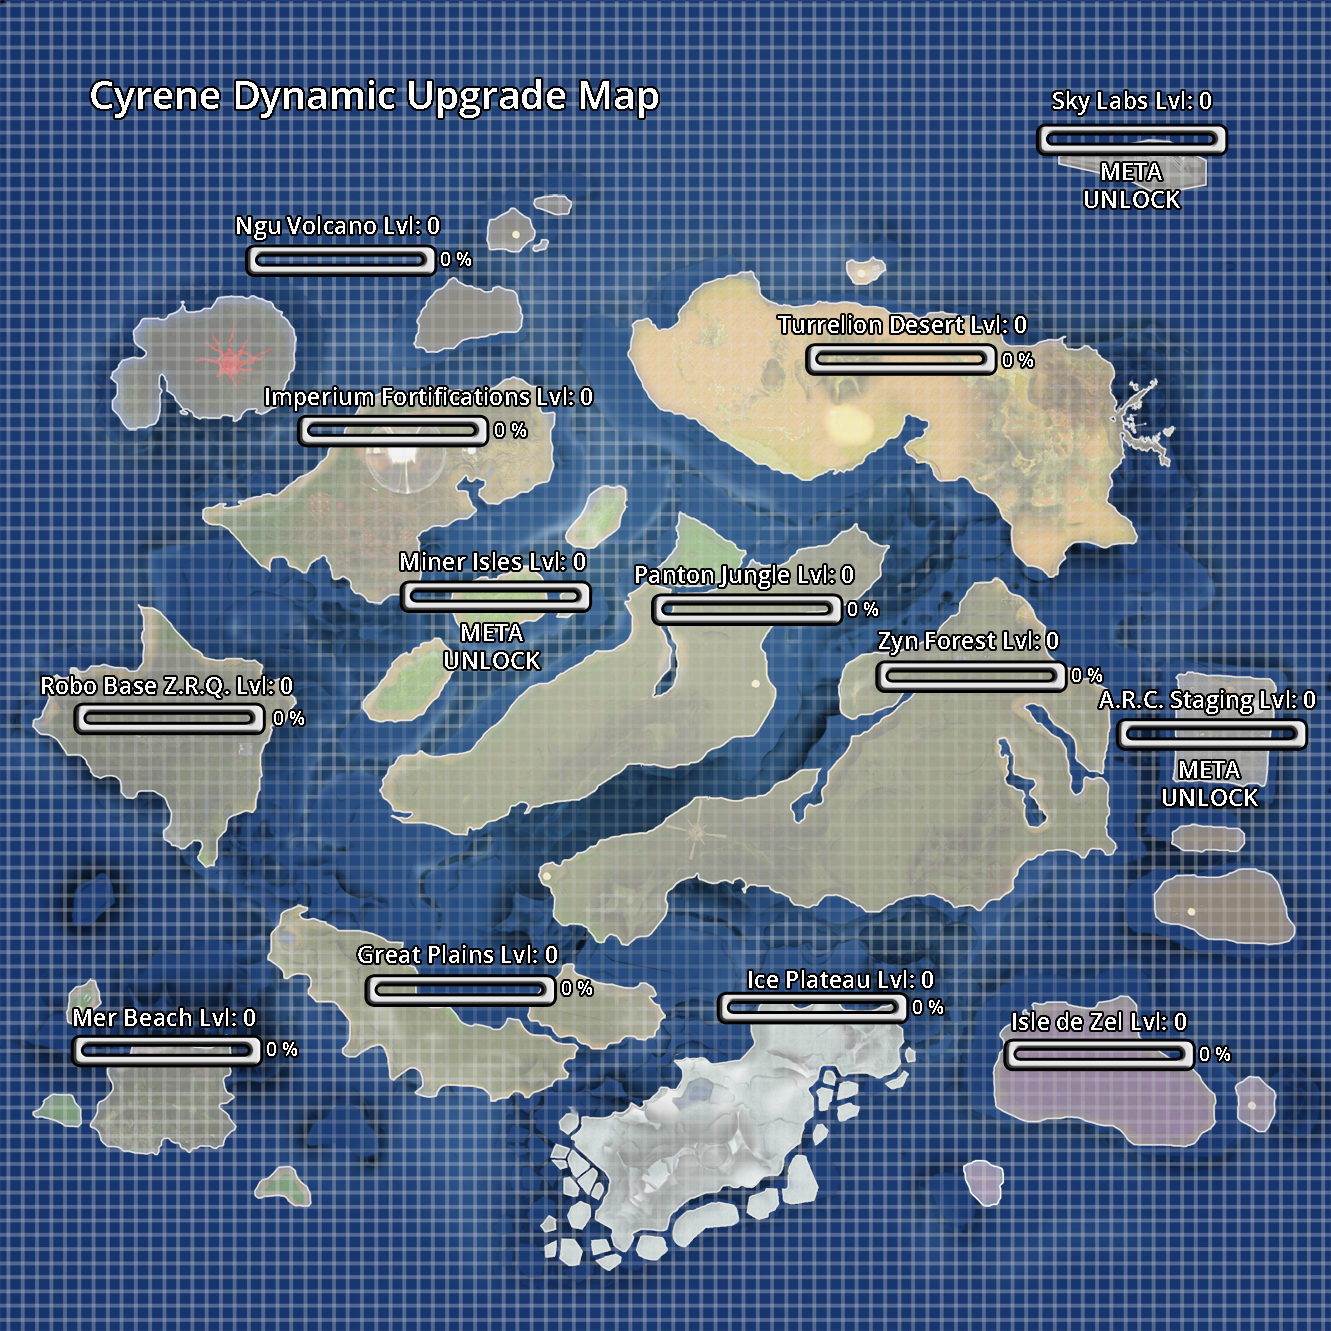 Cyrene Dymanic Upgrade Map - October 29th 2014.jpg